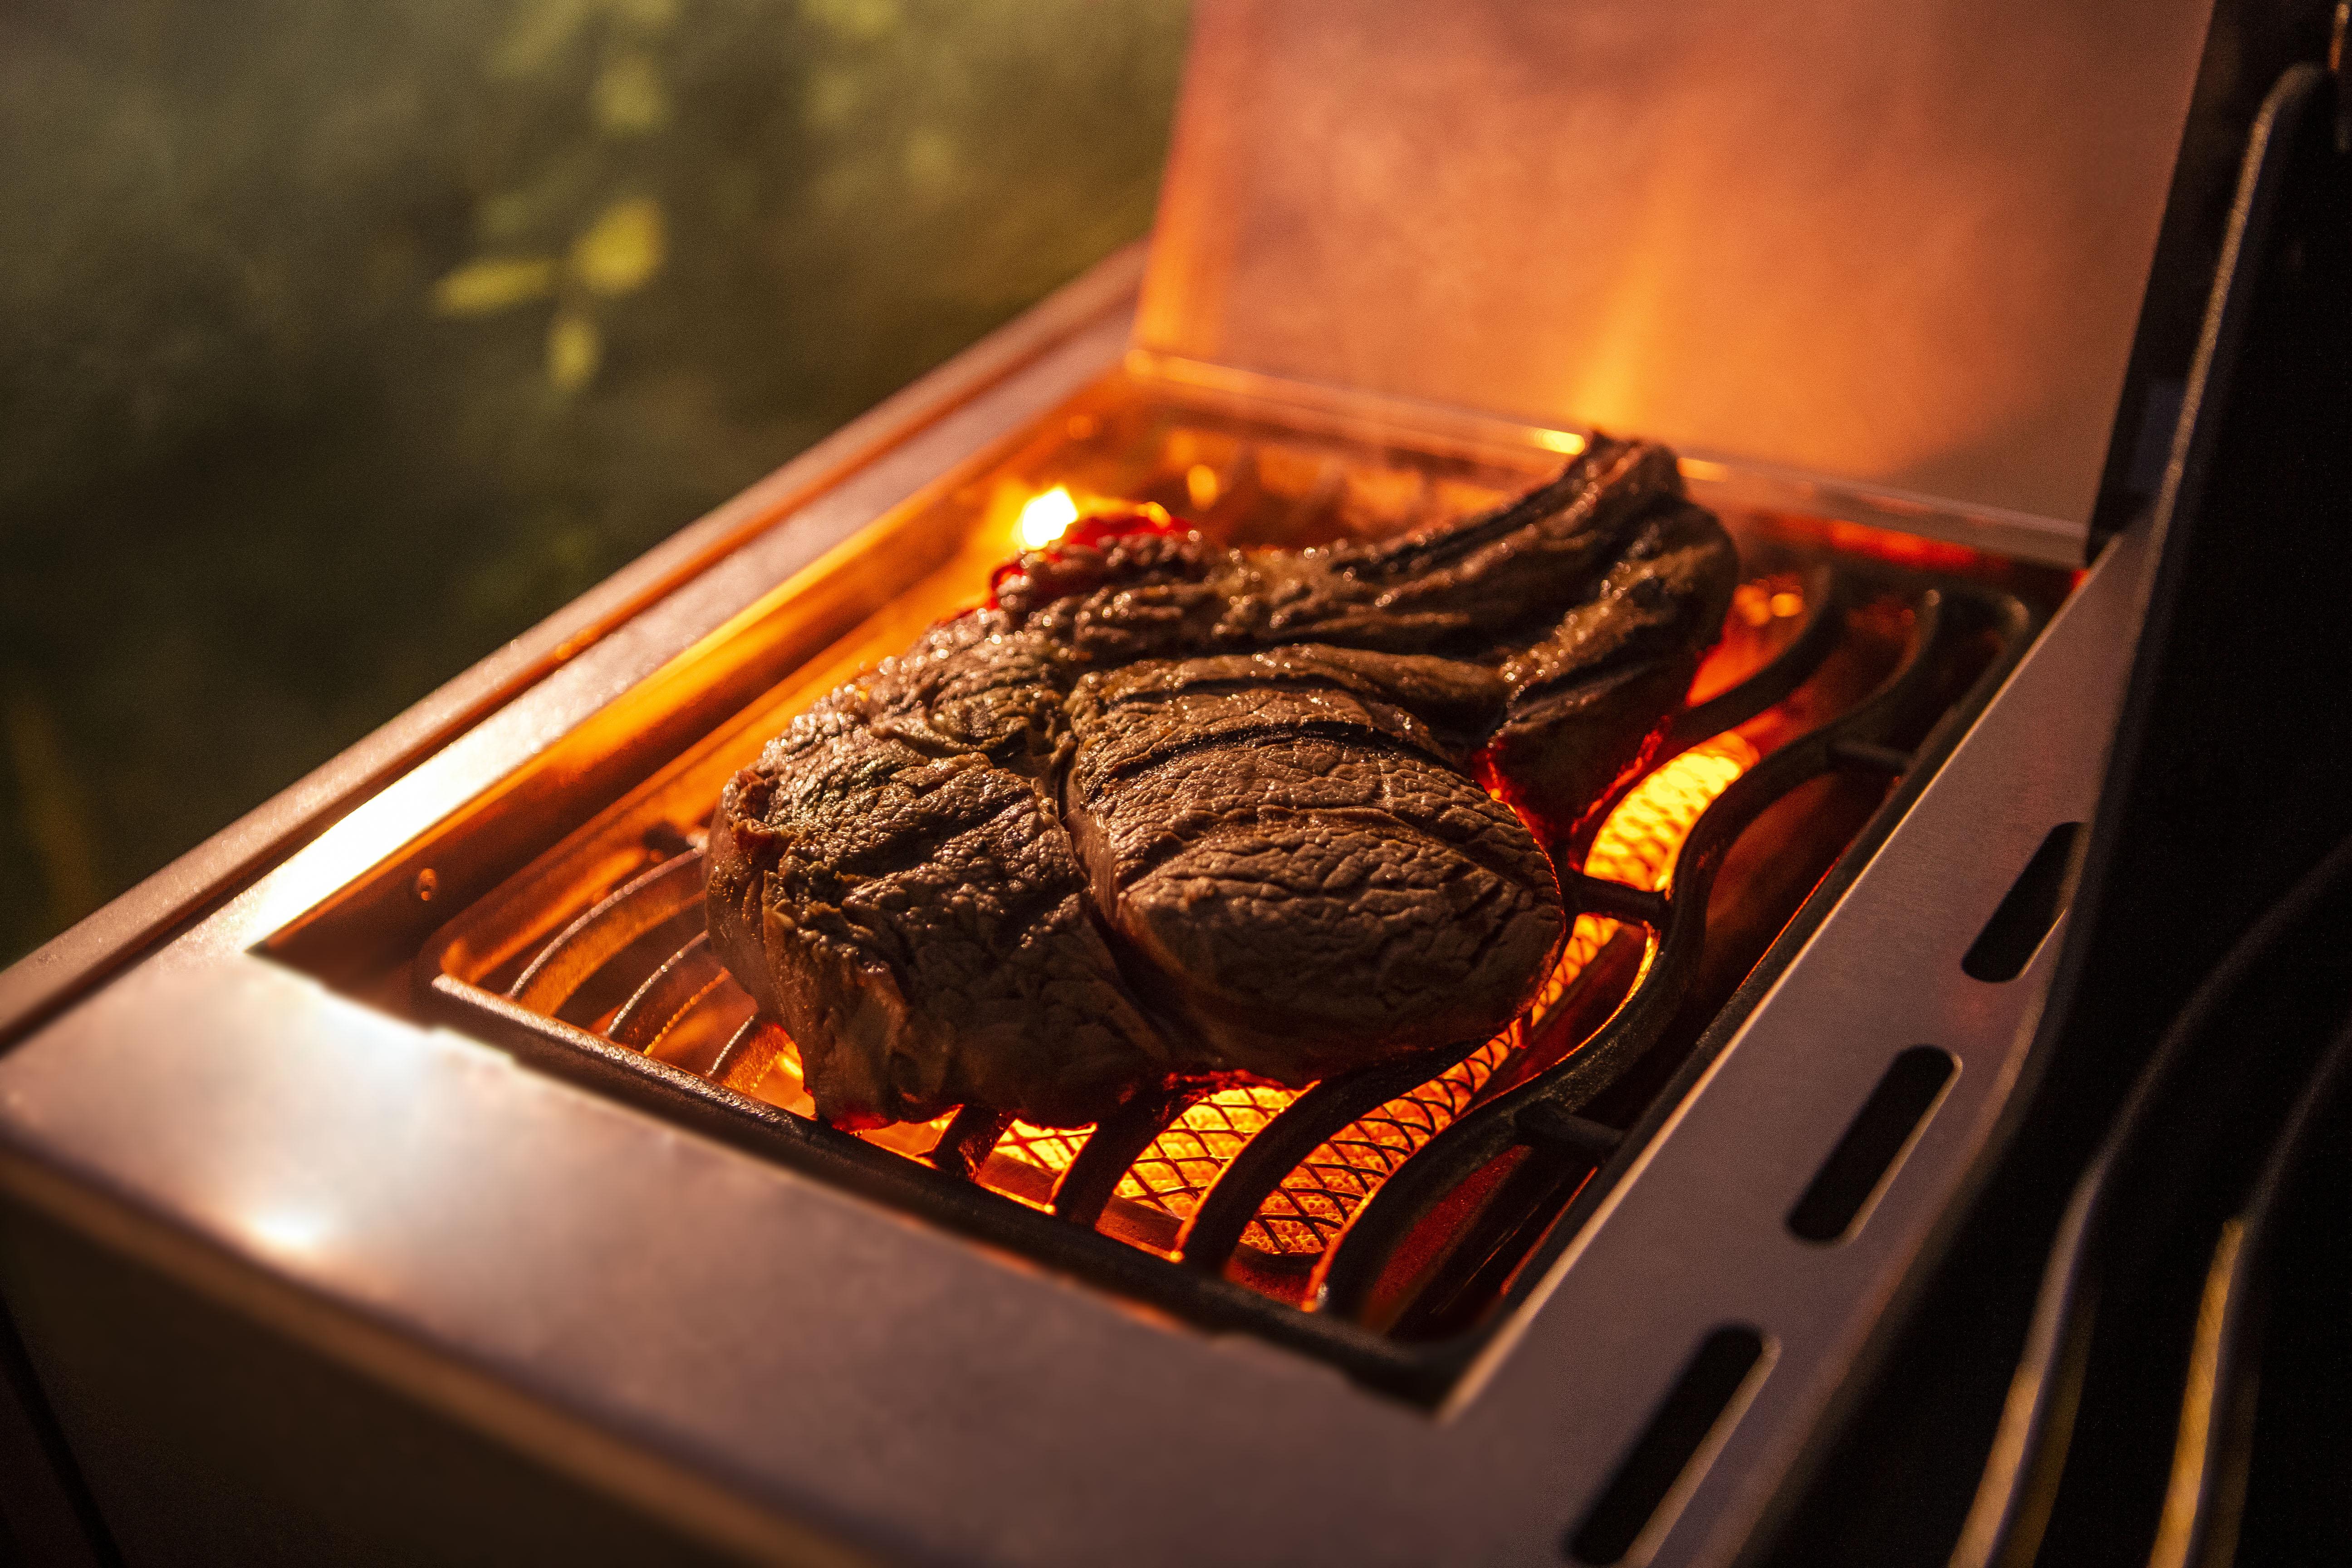 Napoleon Gasgrill Outdoorküche : Gasgrill grillwagen napoleon rogue edelstahl propangas